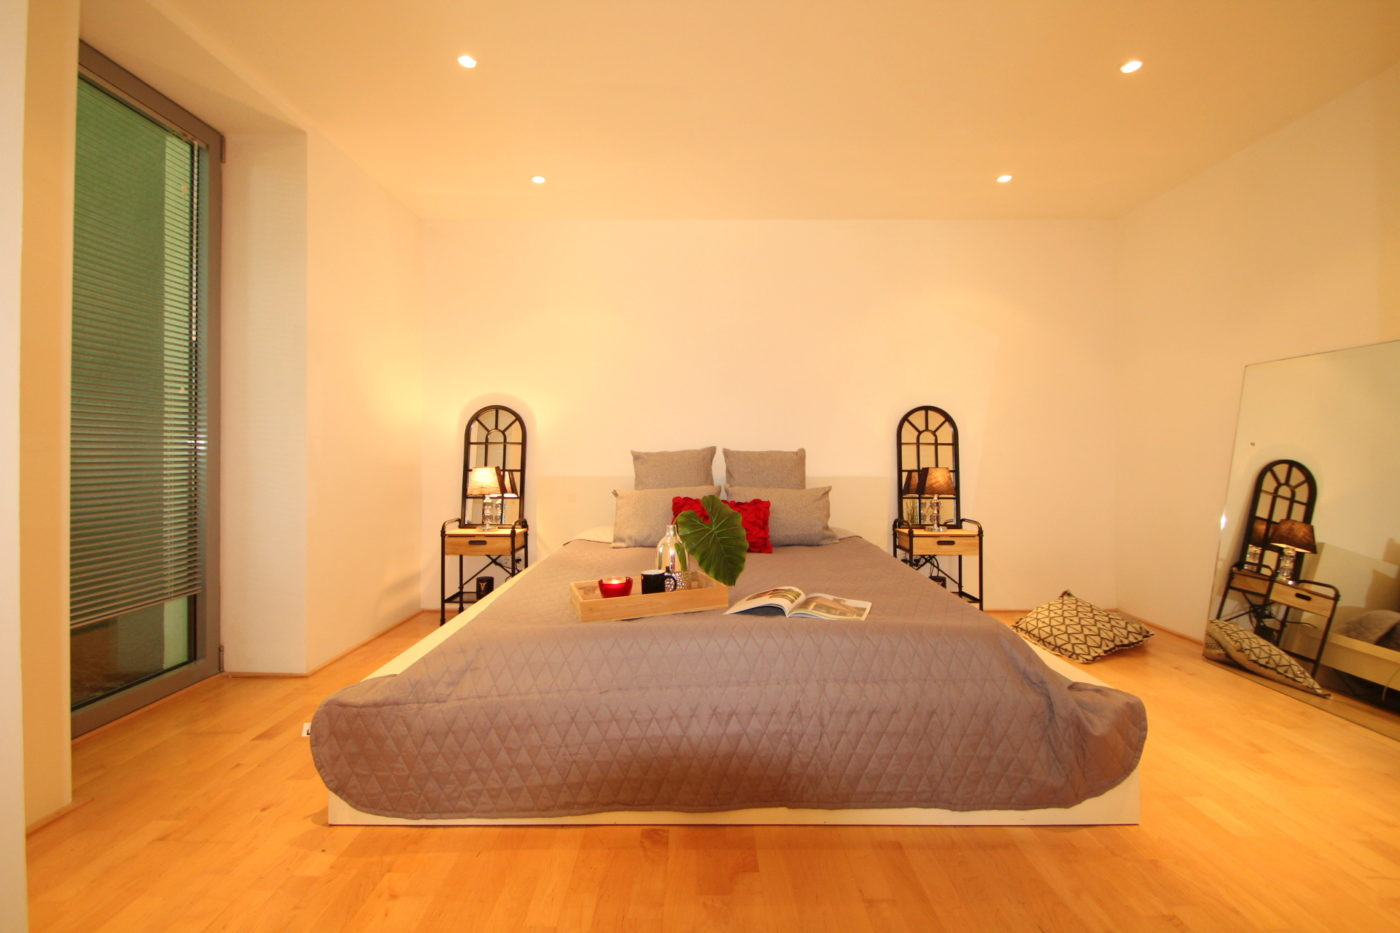 Immobilien erfolgreich verkaufen. Mit Blickfang Homestaging optimale Verkaufserfolge erzielen